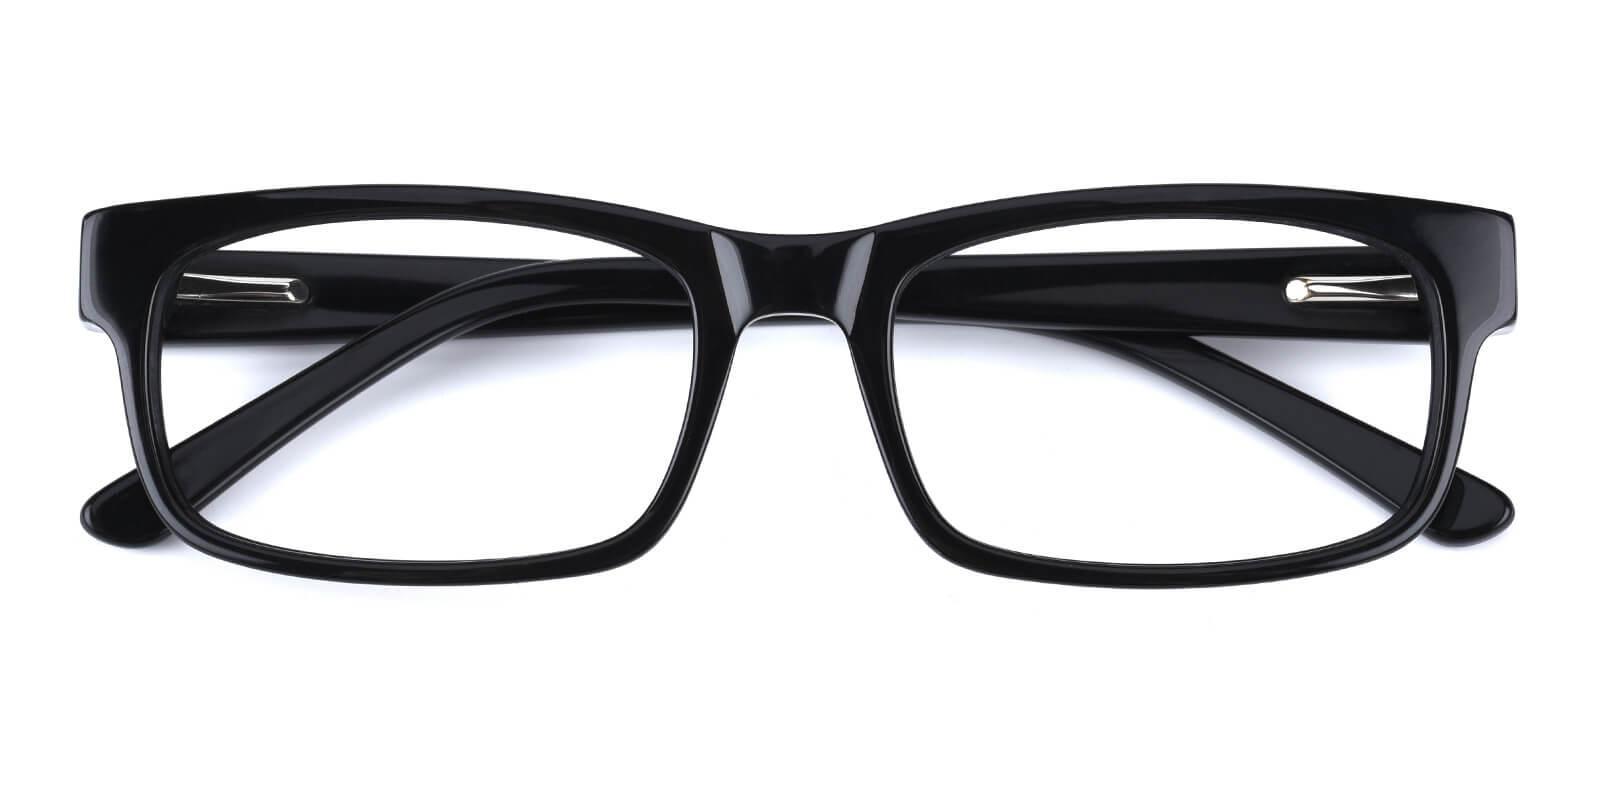 Eware-Black-Rectangle-Acetate-Eyeglasses-detail